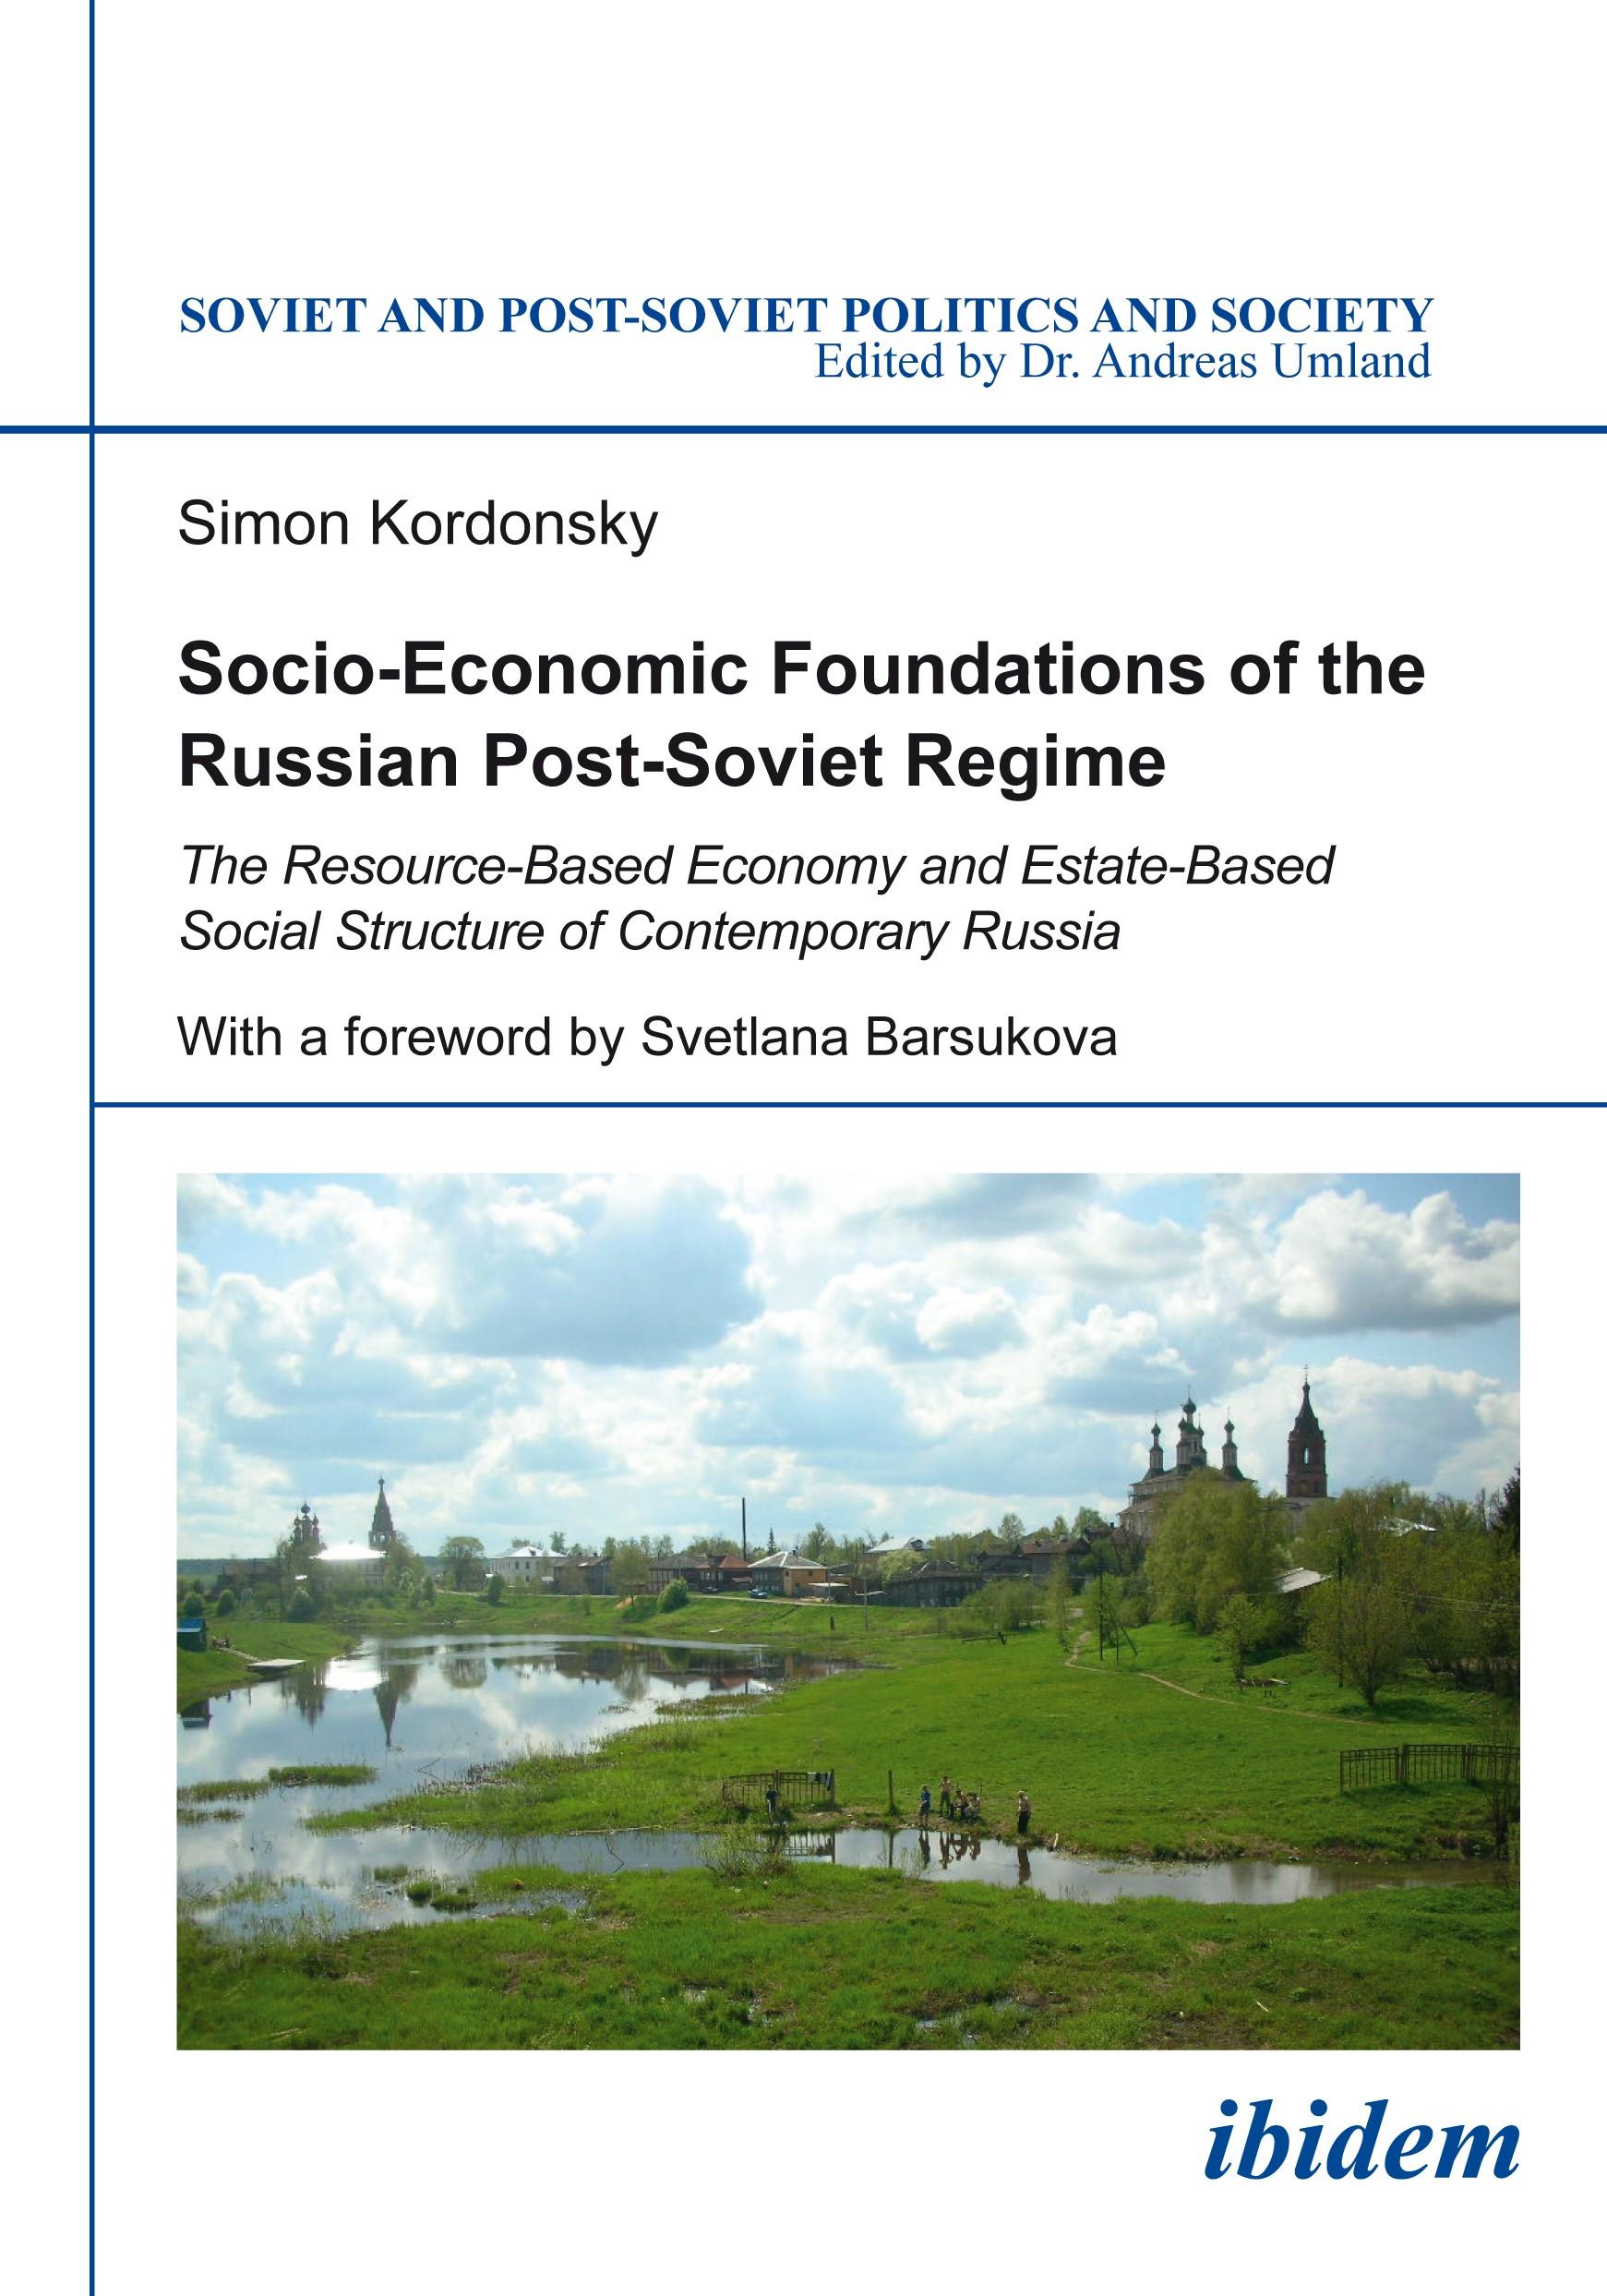 Socio-Economic Foundations of the Russian Post-Soviet Regime.